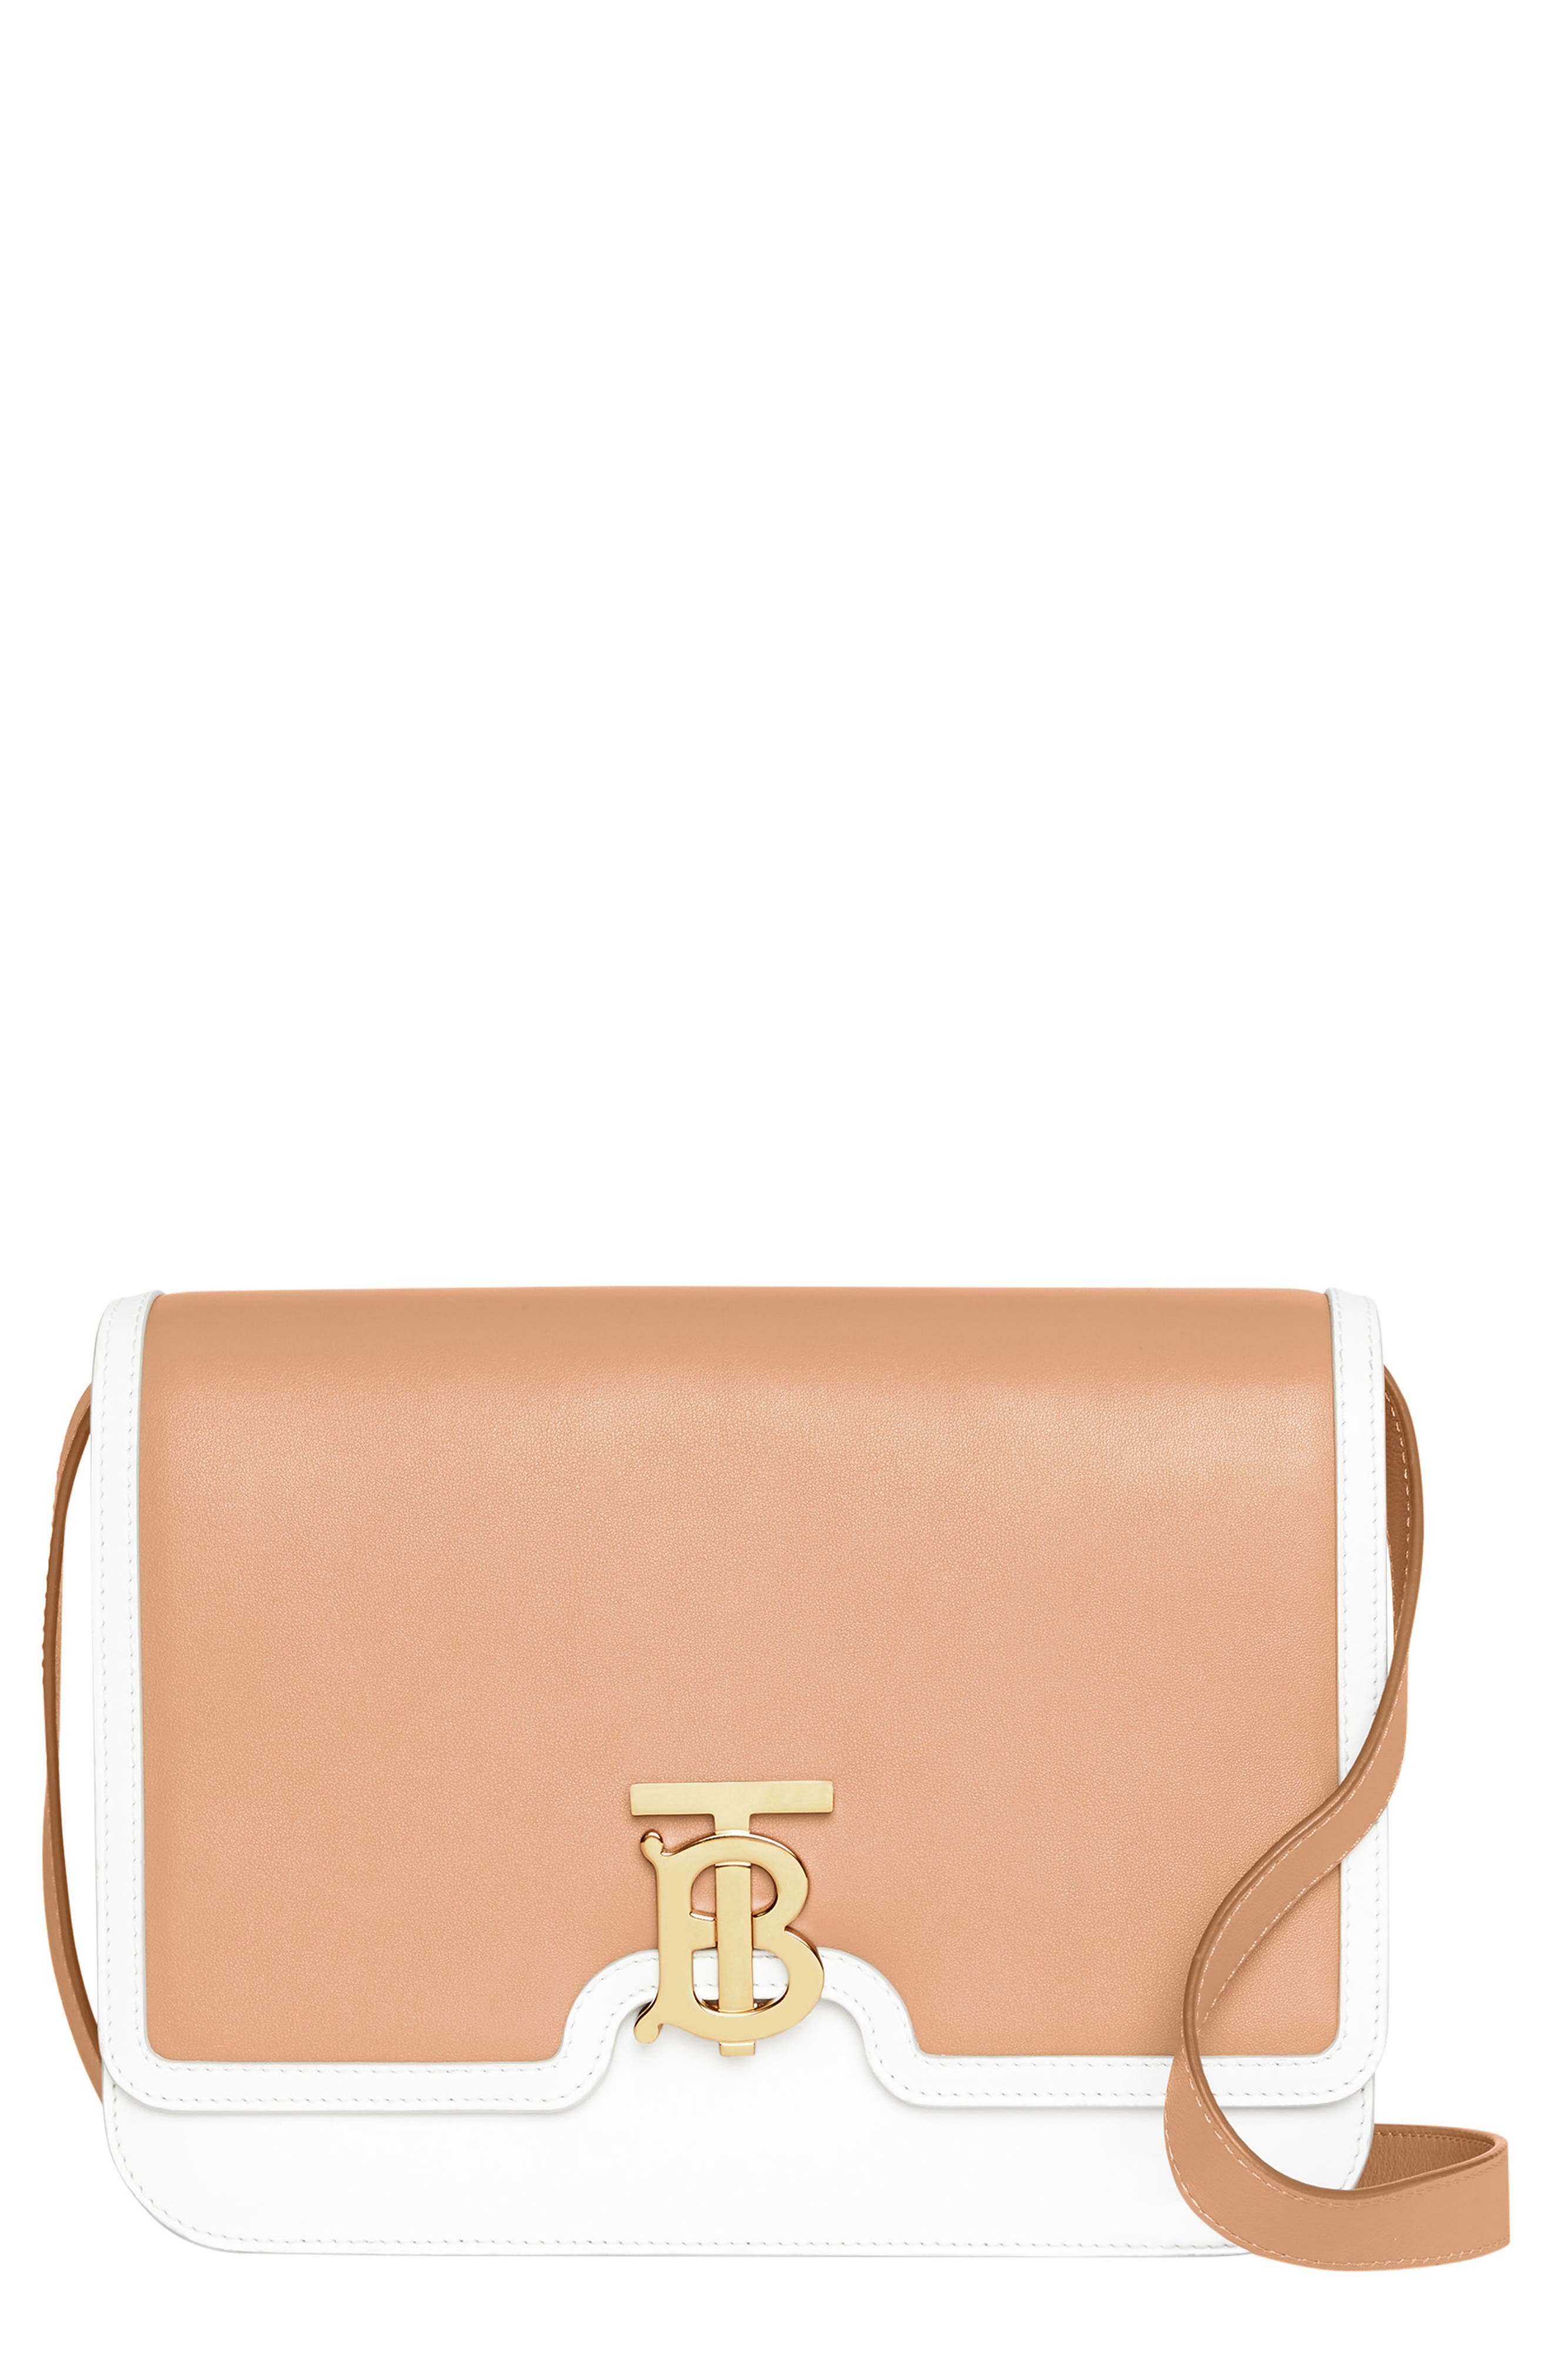 BURBERRY Medium Two-Tone Leather TB Bag, Main, color, CHALK WHITE/ LIGHT CAMEL